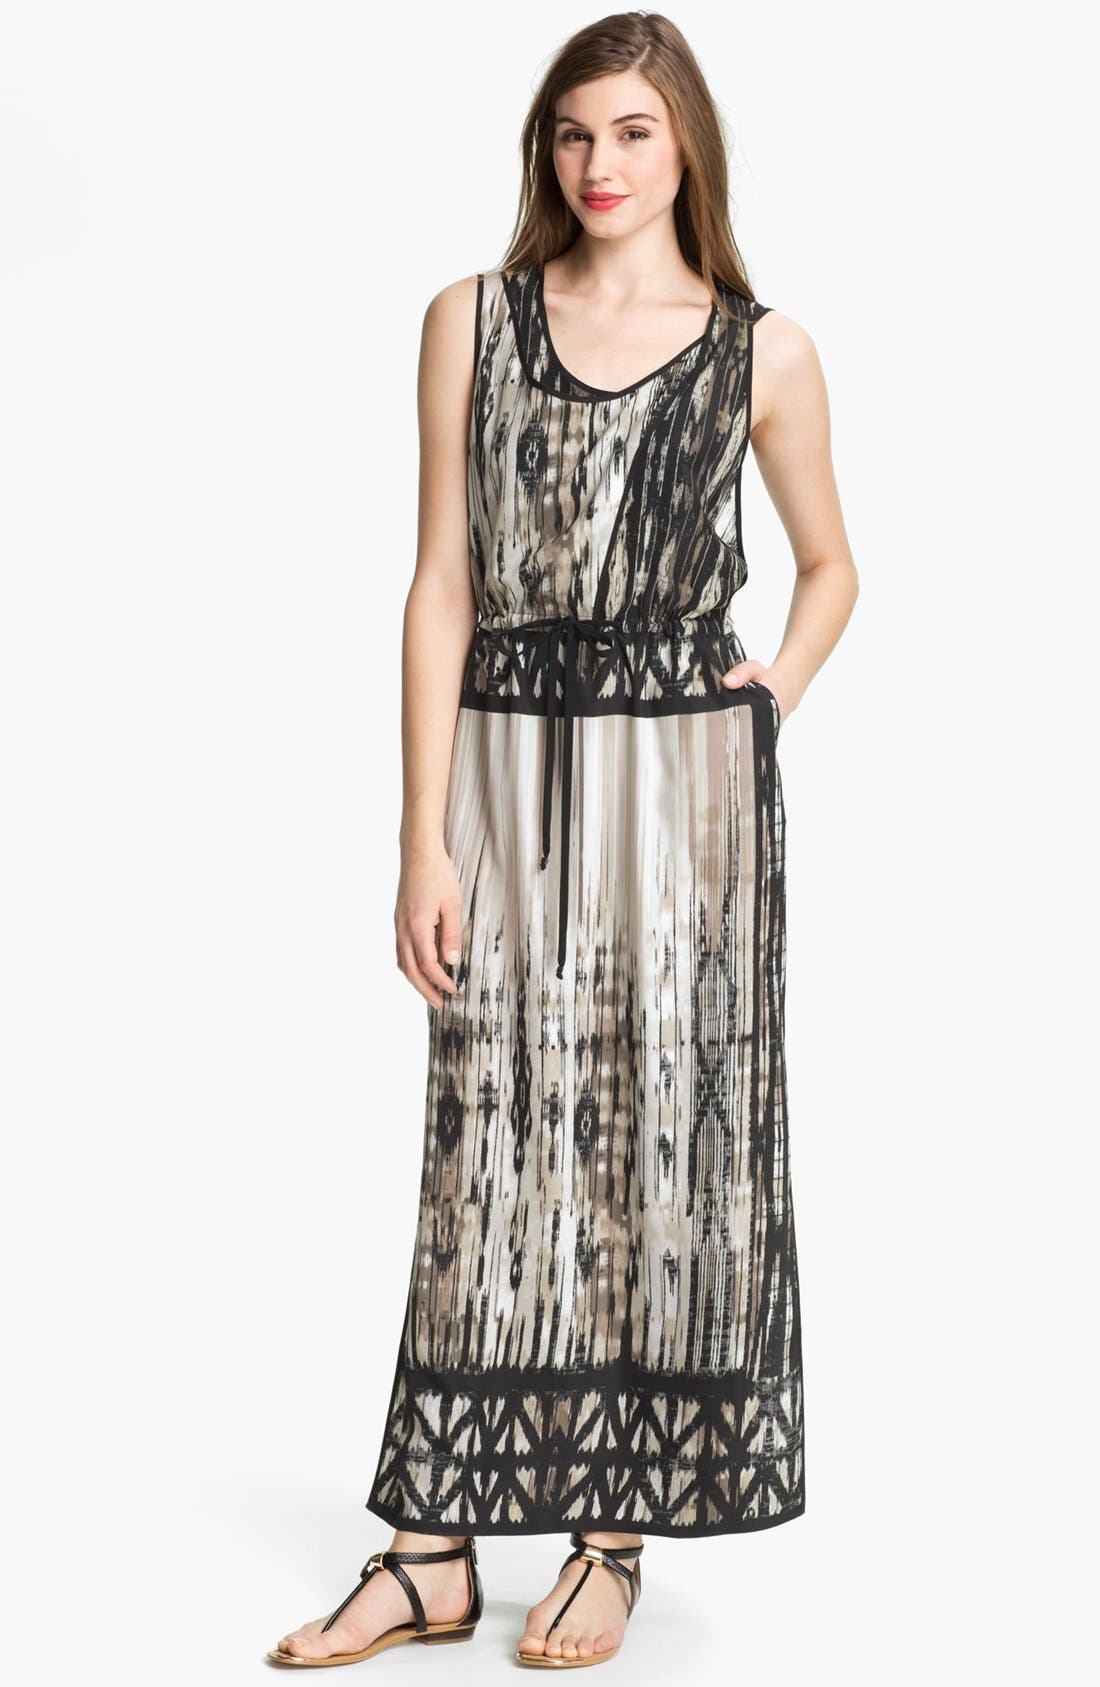 Alternate Image 1 Selected - Kenneth Cole New York 'Orbital' Print Maxi Dress